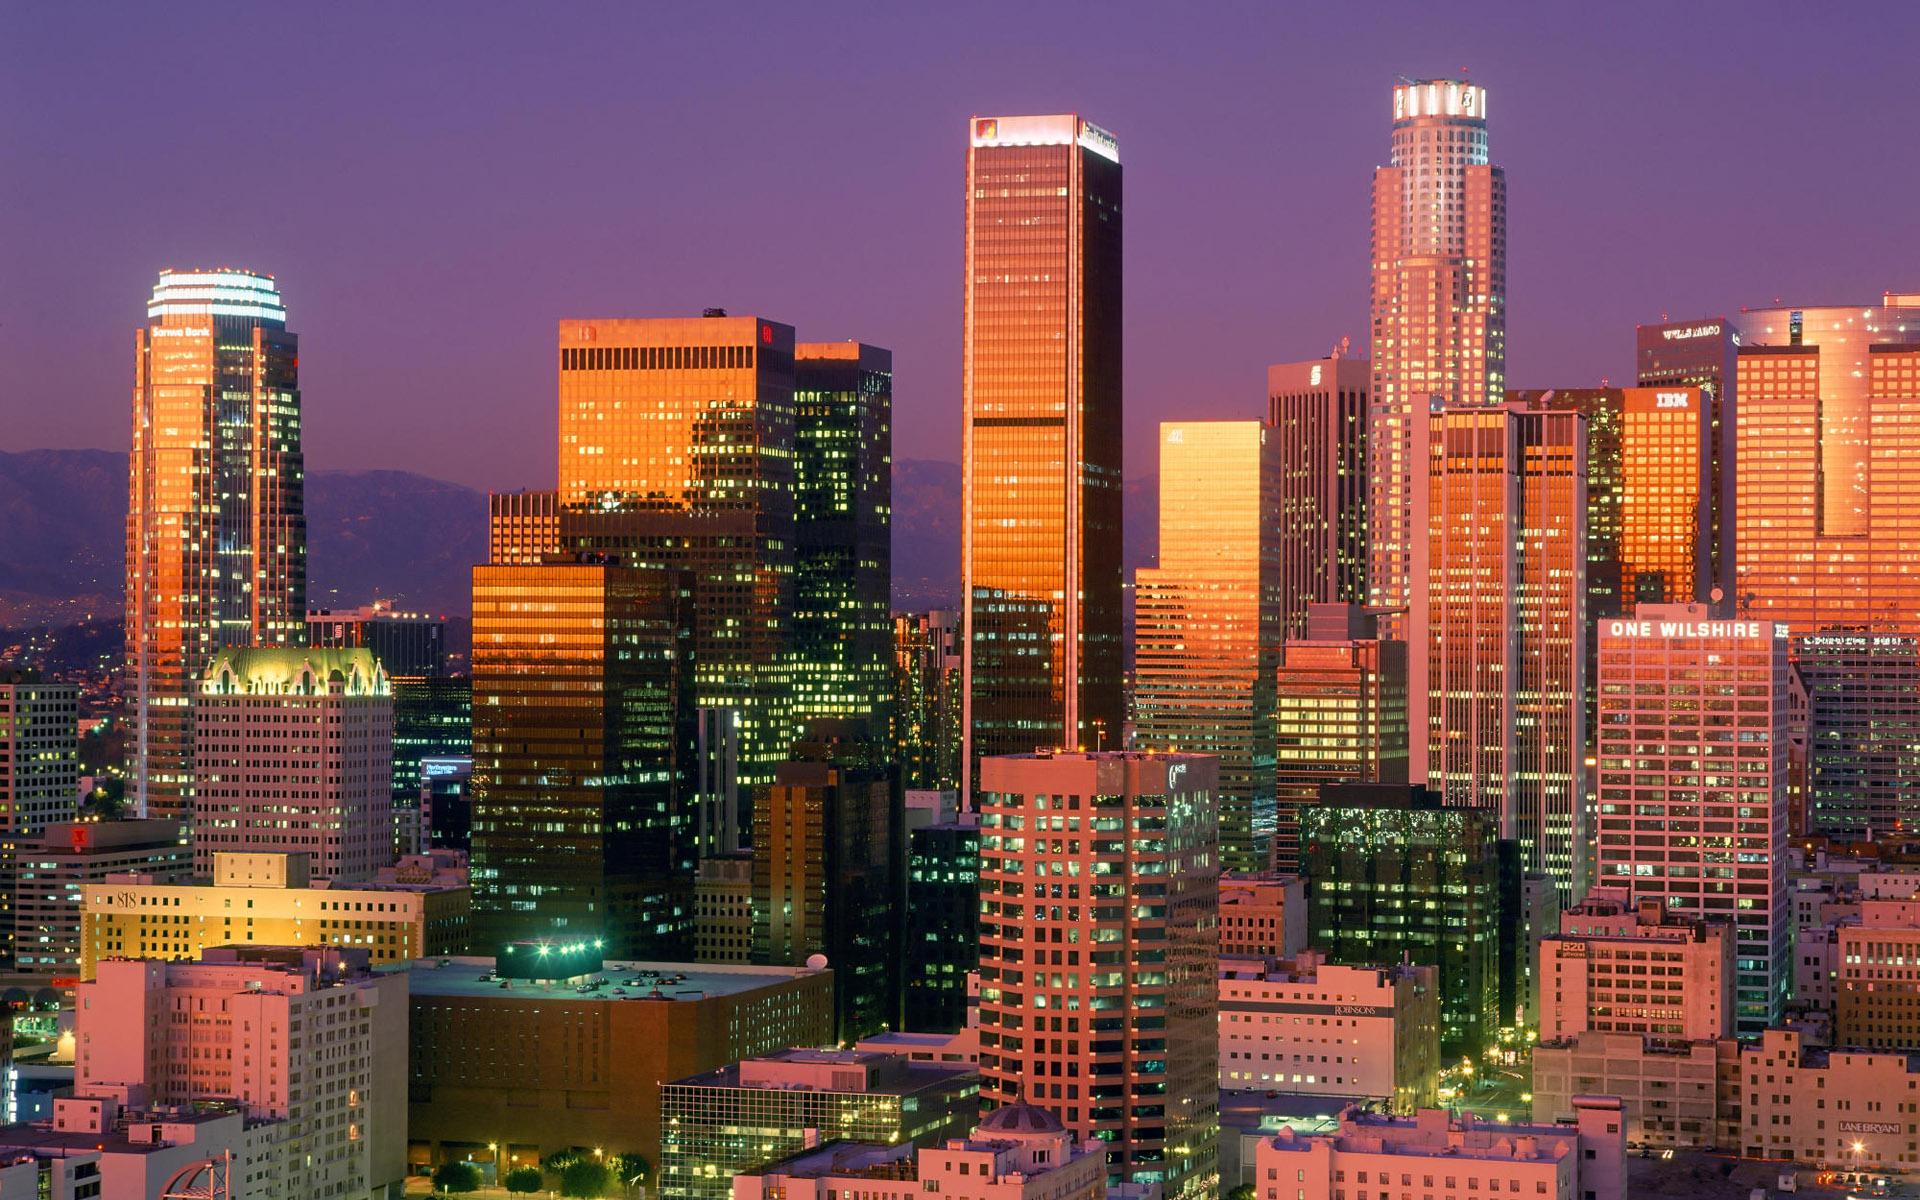 Urban Landscape Series VIII 16831 - City night - Building